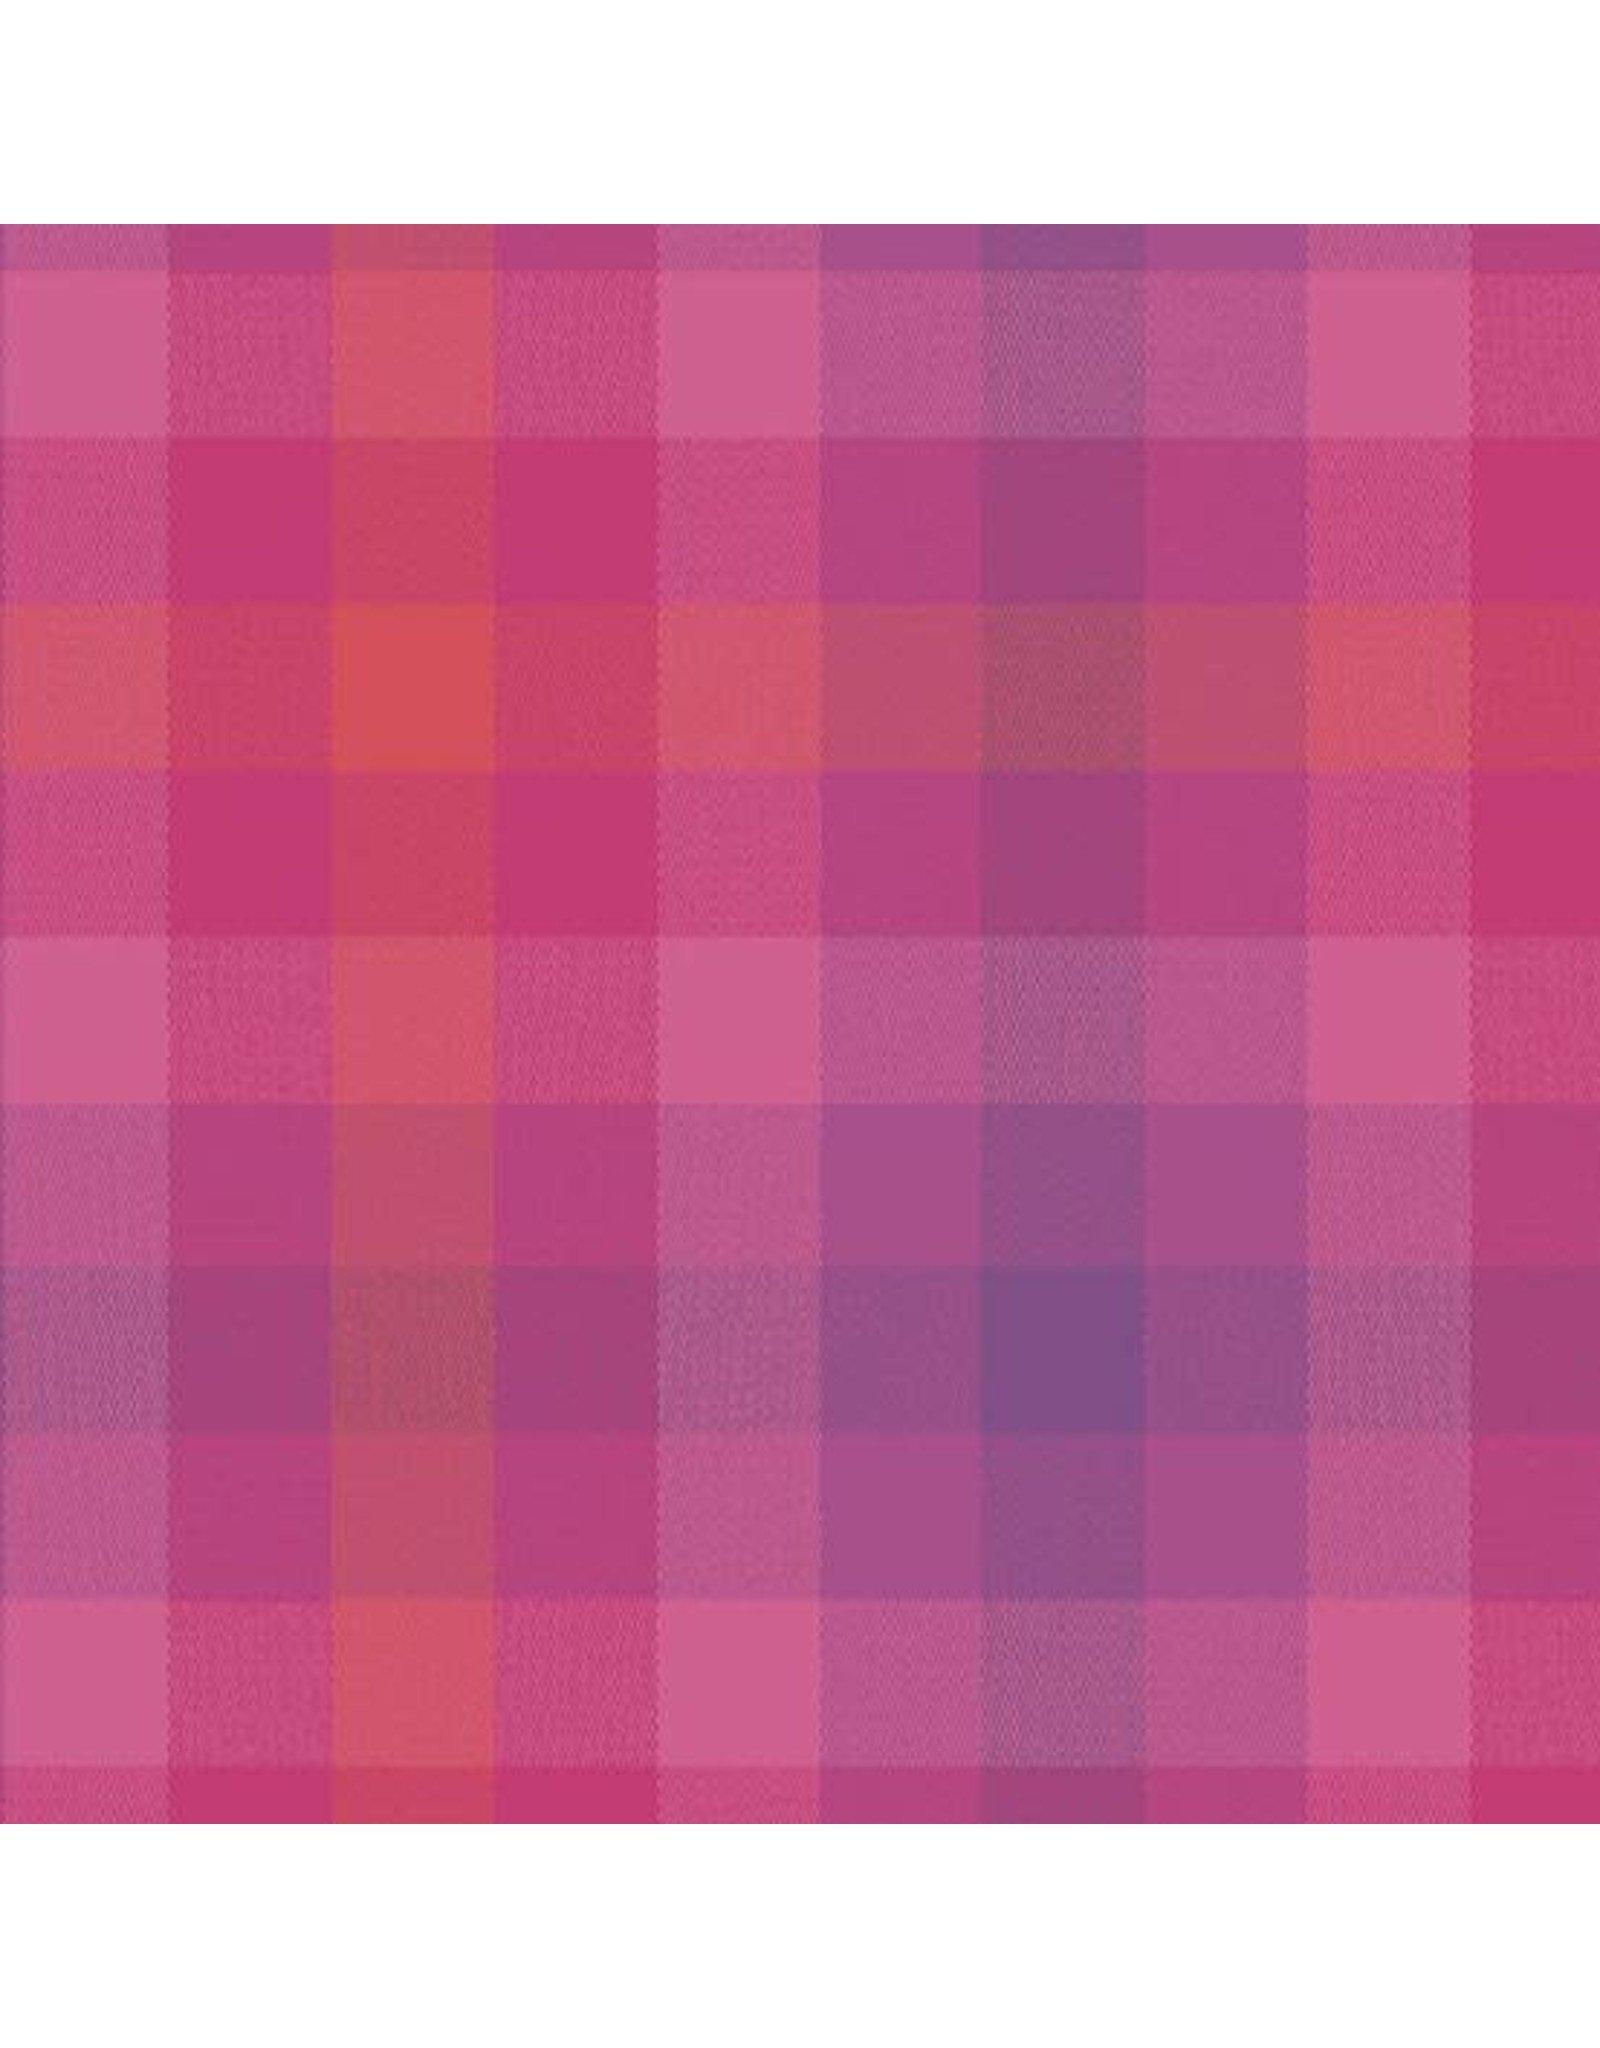 Alison Glass Kaleidoscope Stripes and Plaids, Plaid in Magenta, Fabric Half-Yards